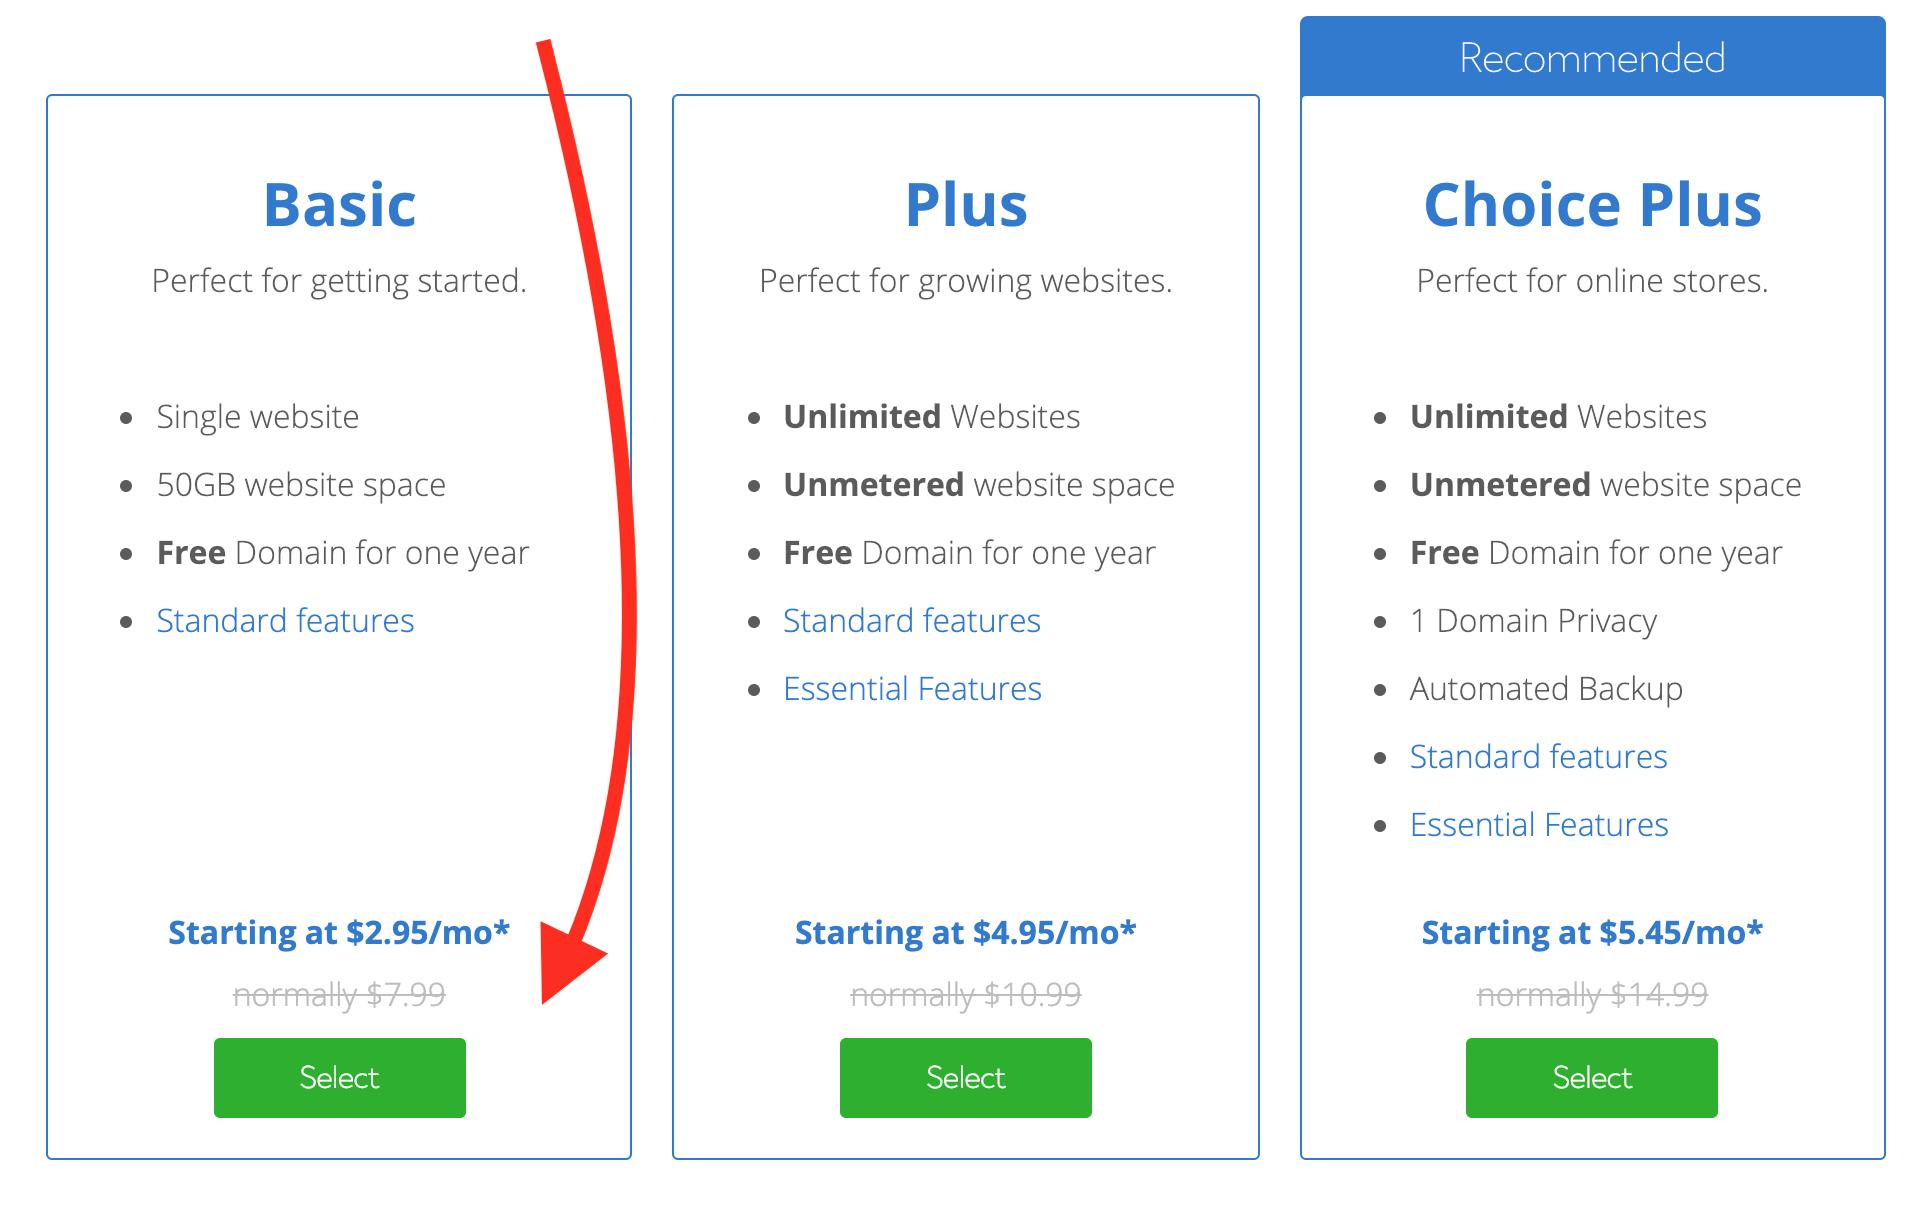 Bluehost basic - great hosting plan to create a WordPress blog